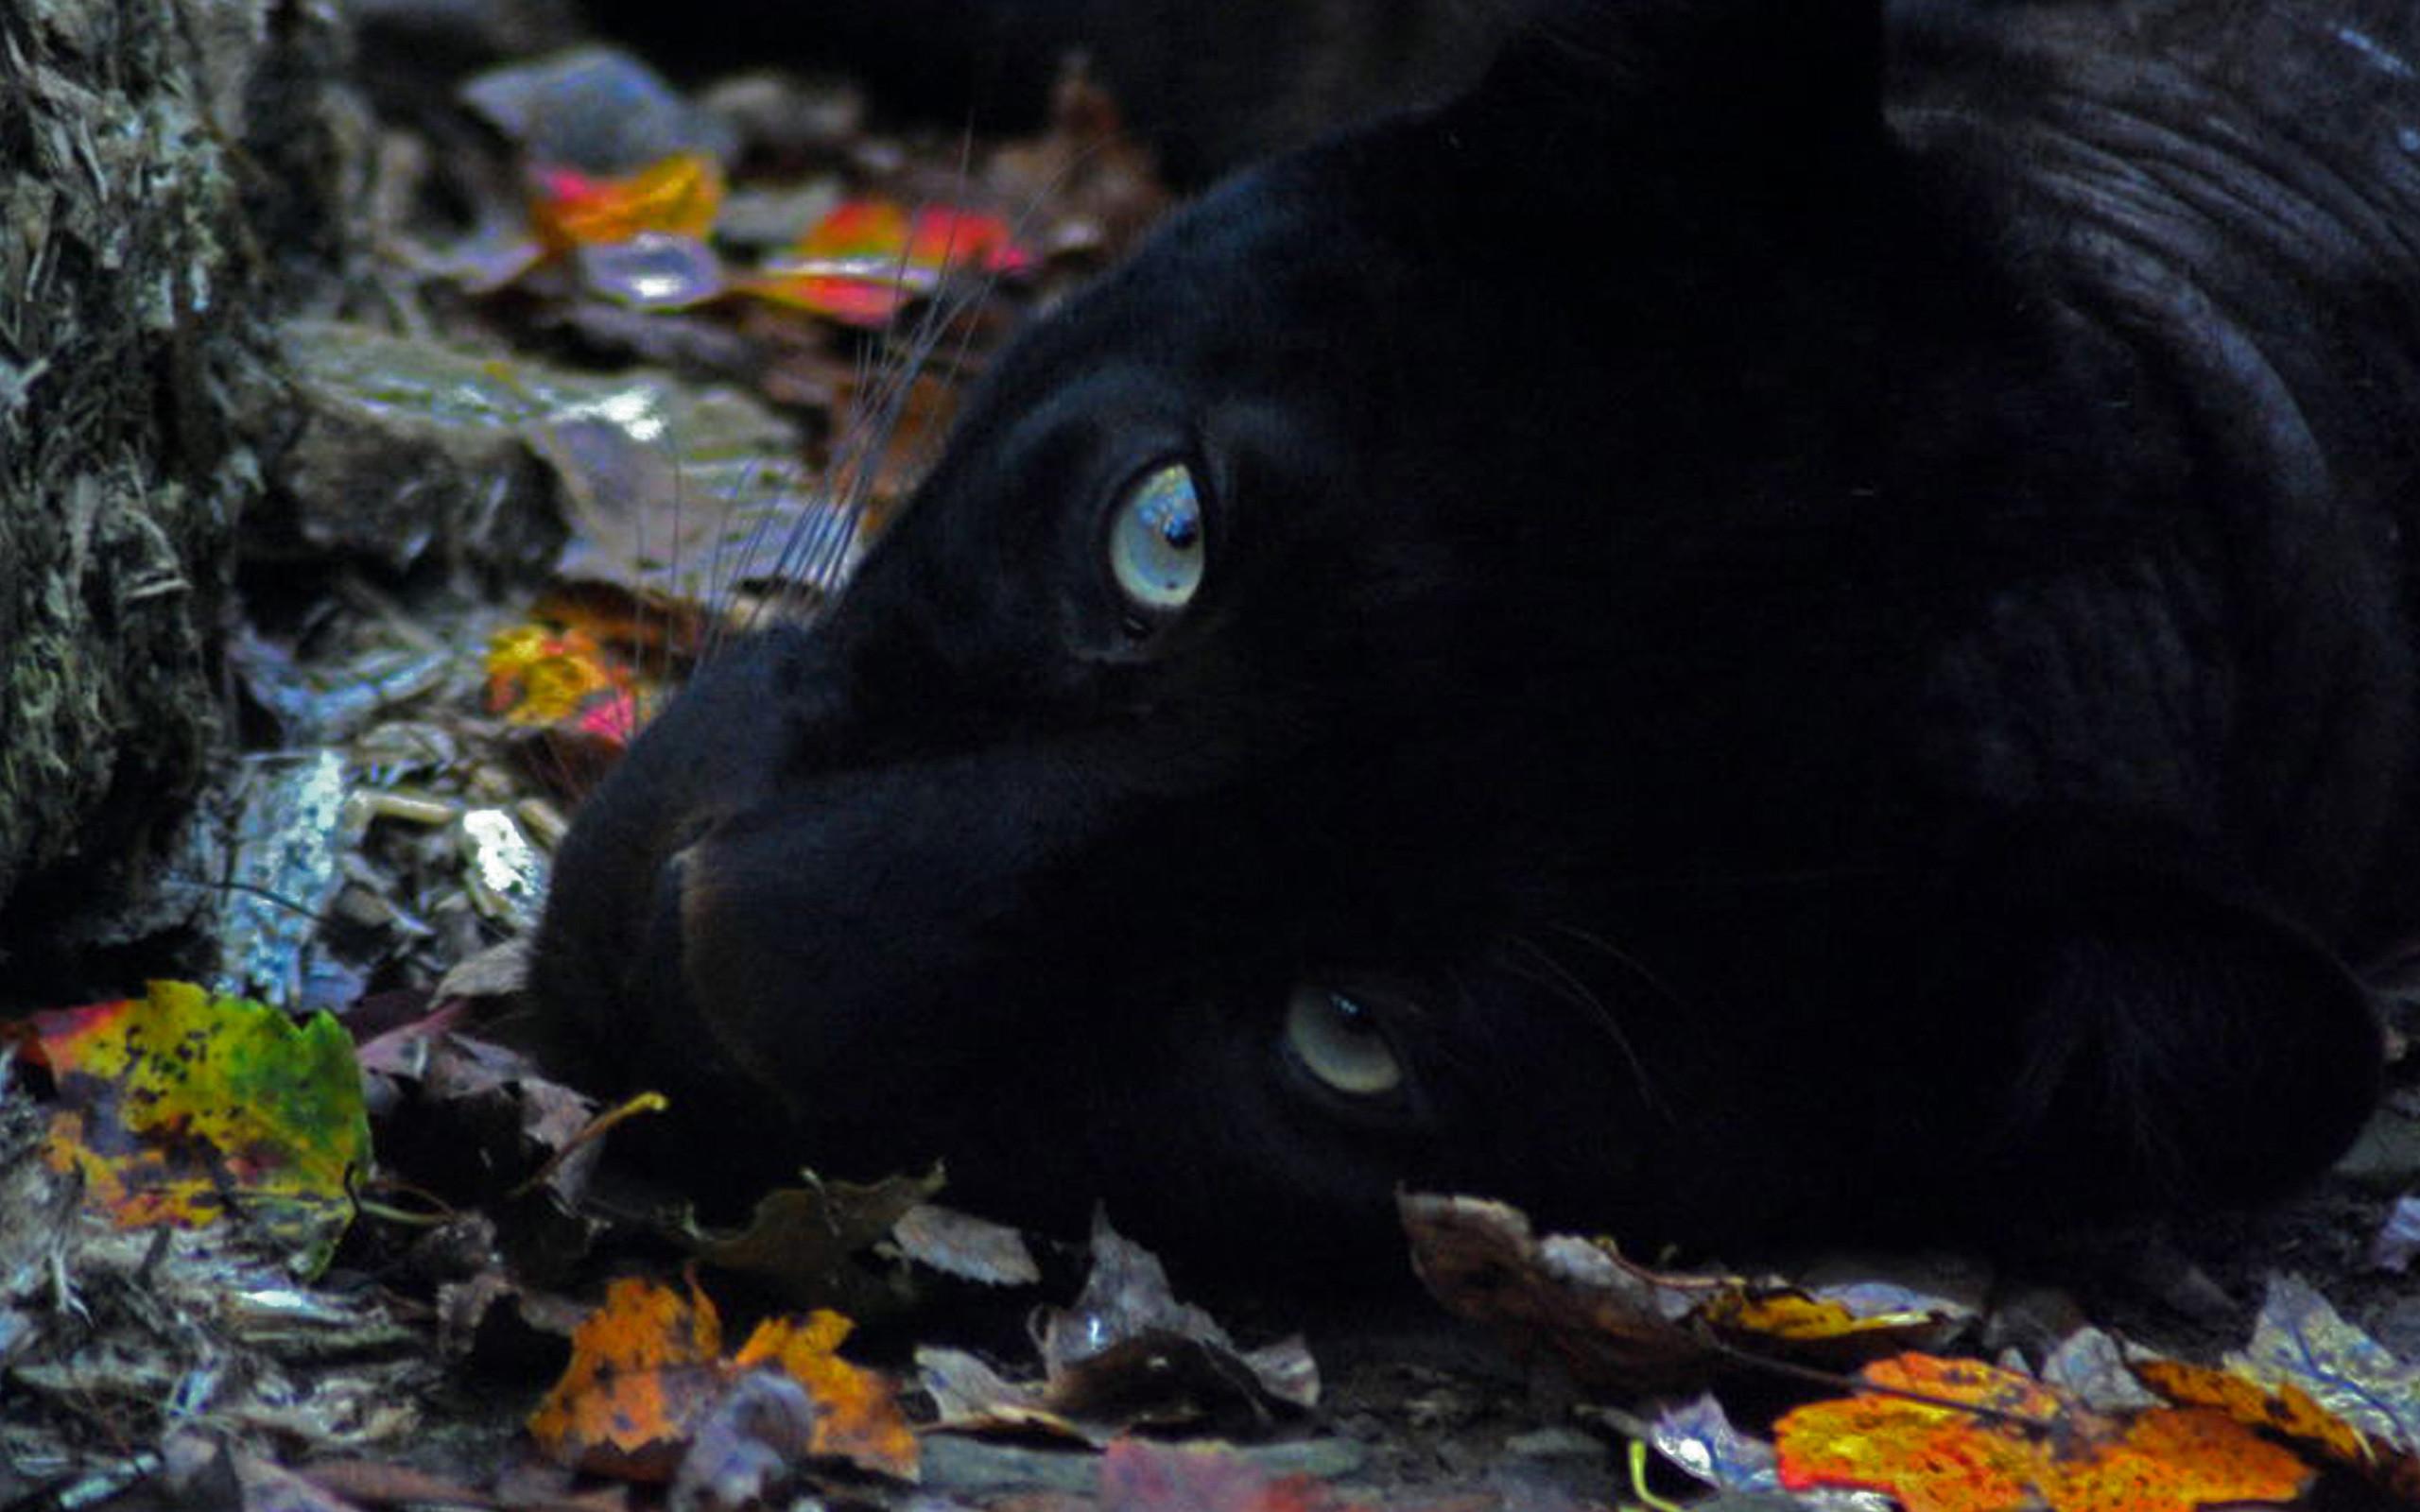 Black jaguar wallpaper 62 pictures black panther hd 3840x2160 voltagebd Images